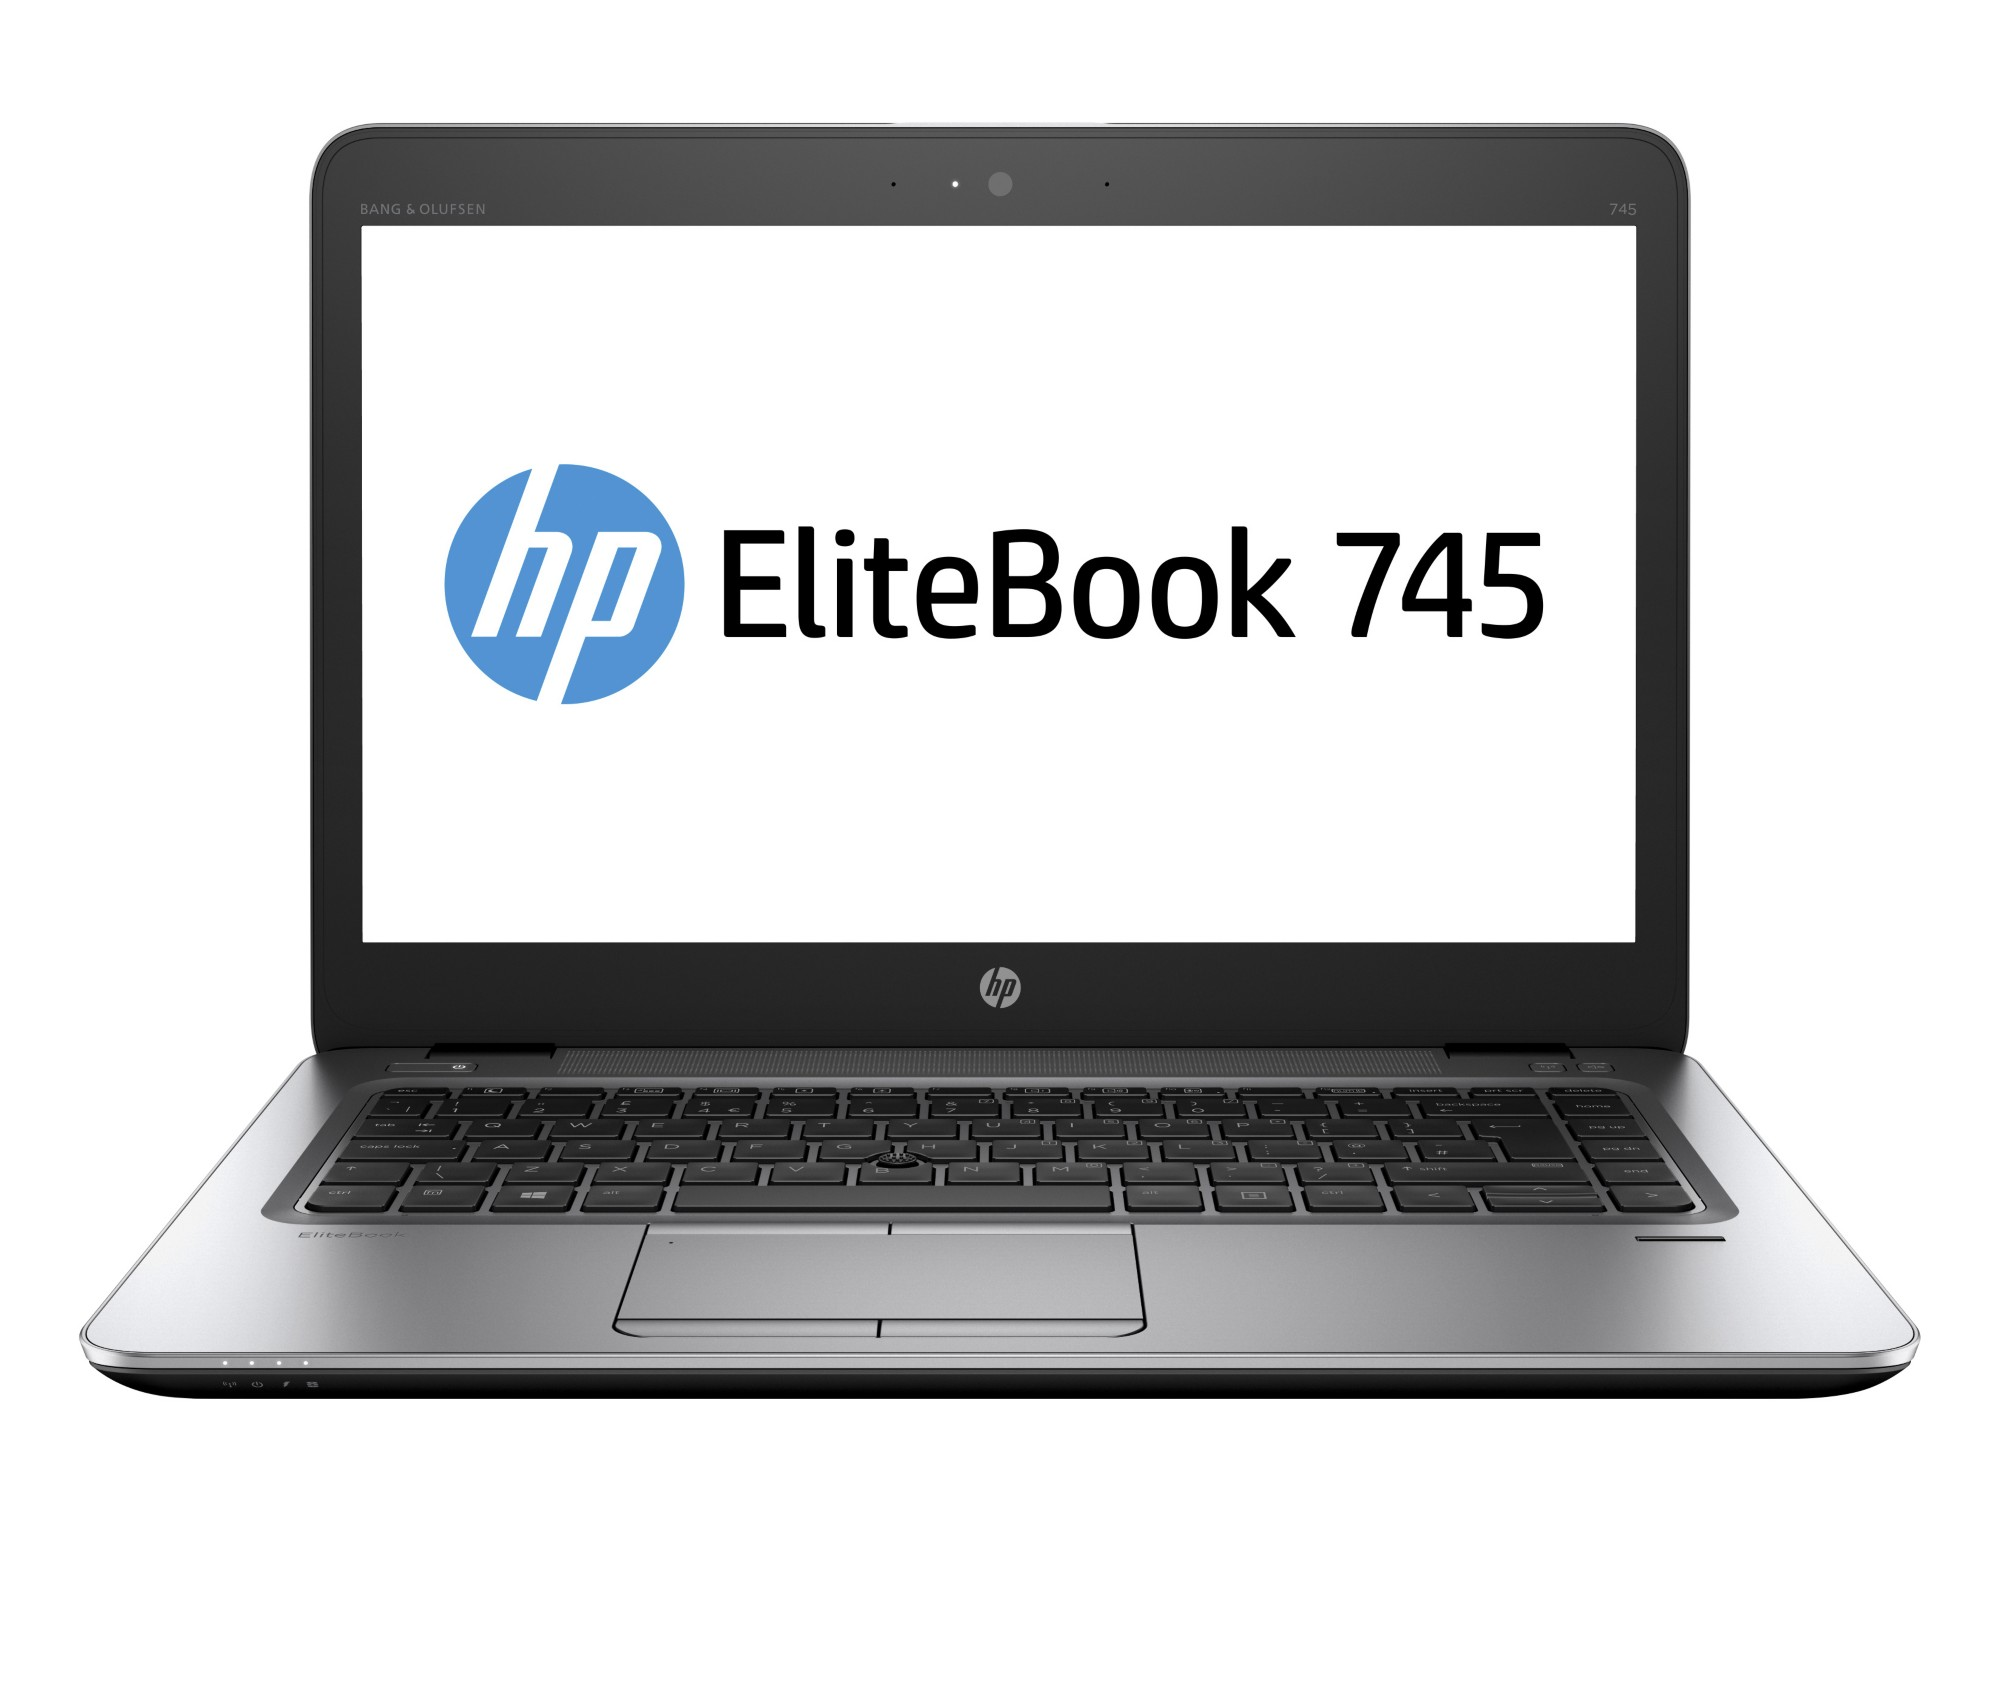 HP EliteBook 745 G3 Notebook PC (ENERGY STAR)